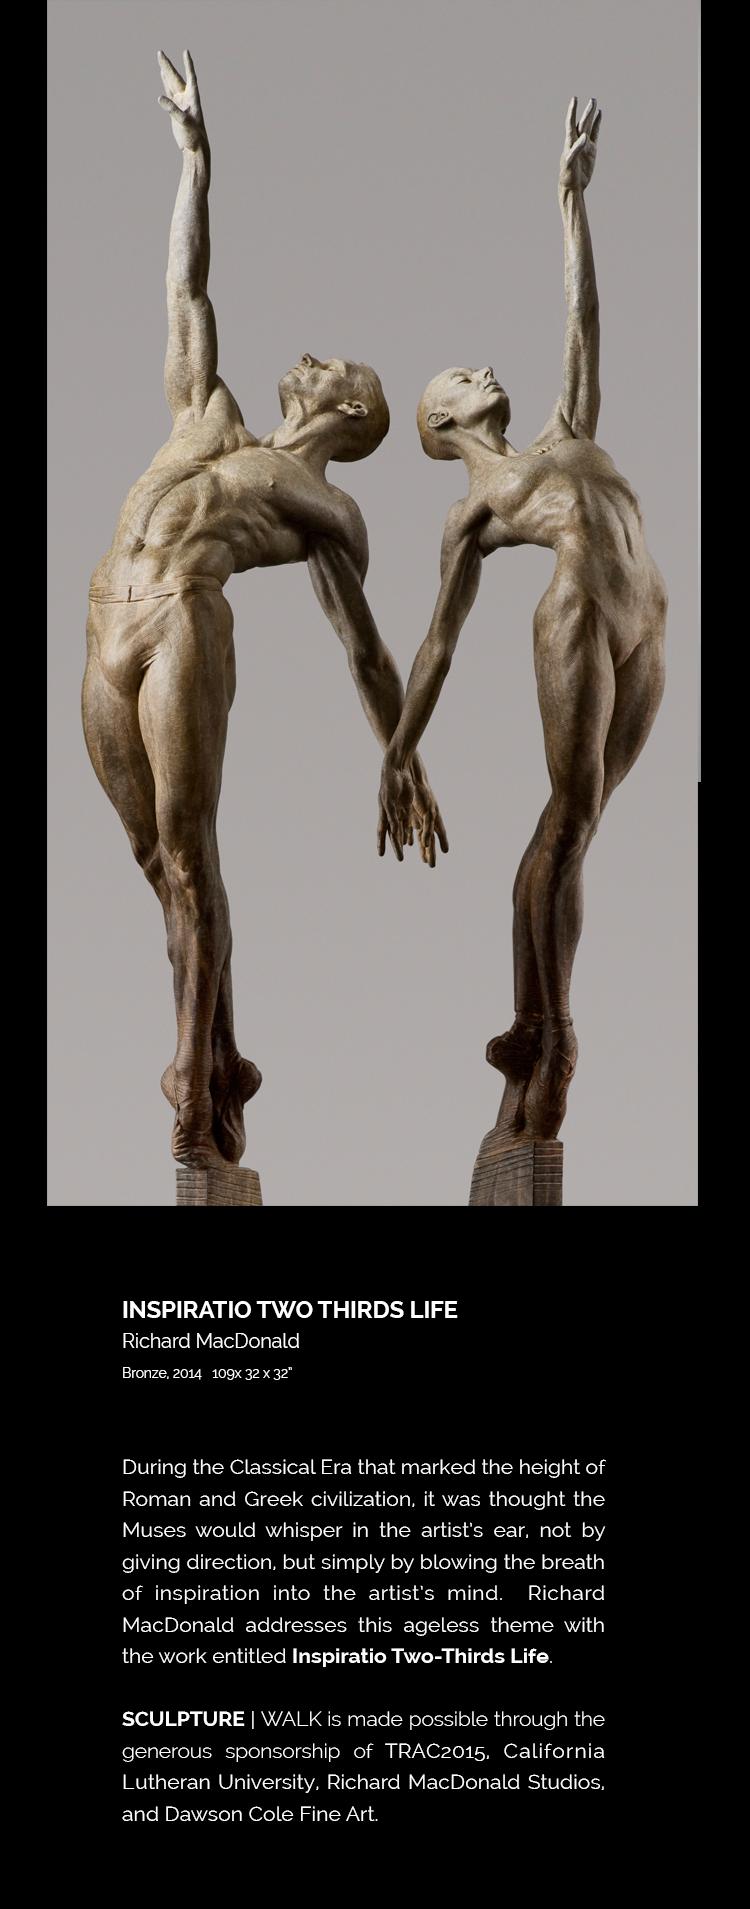 Inspiratio Two Thirds by Richard MacDonald